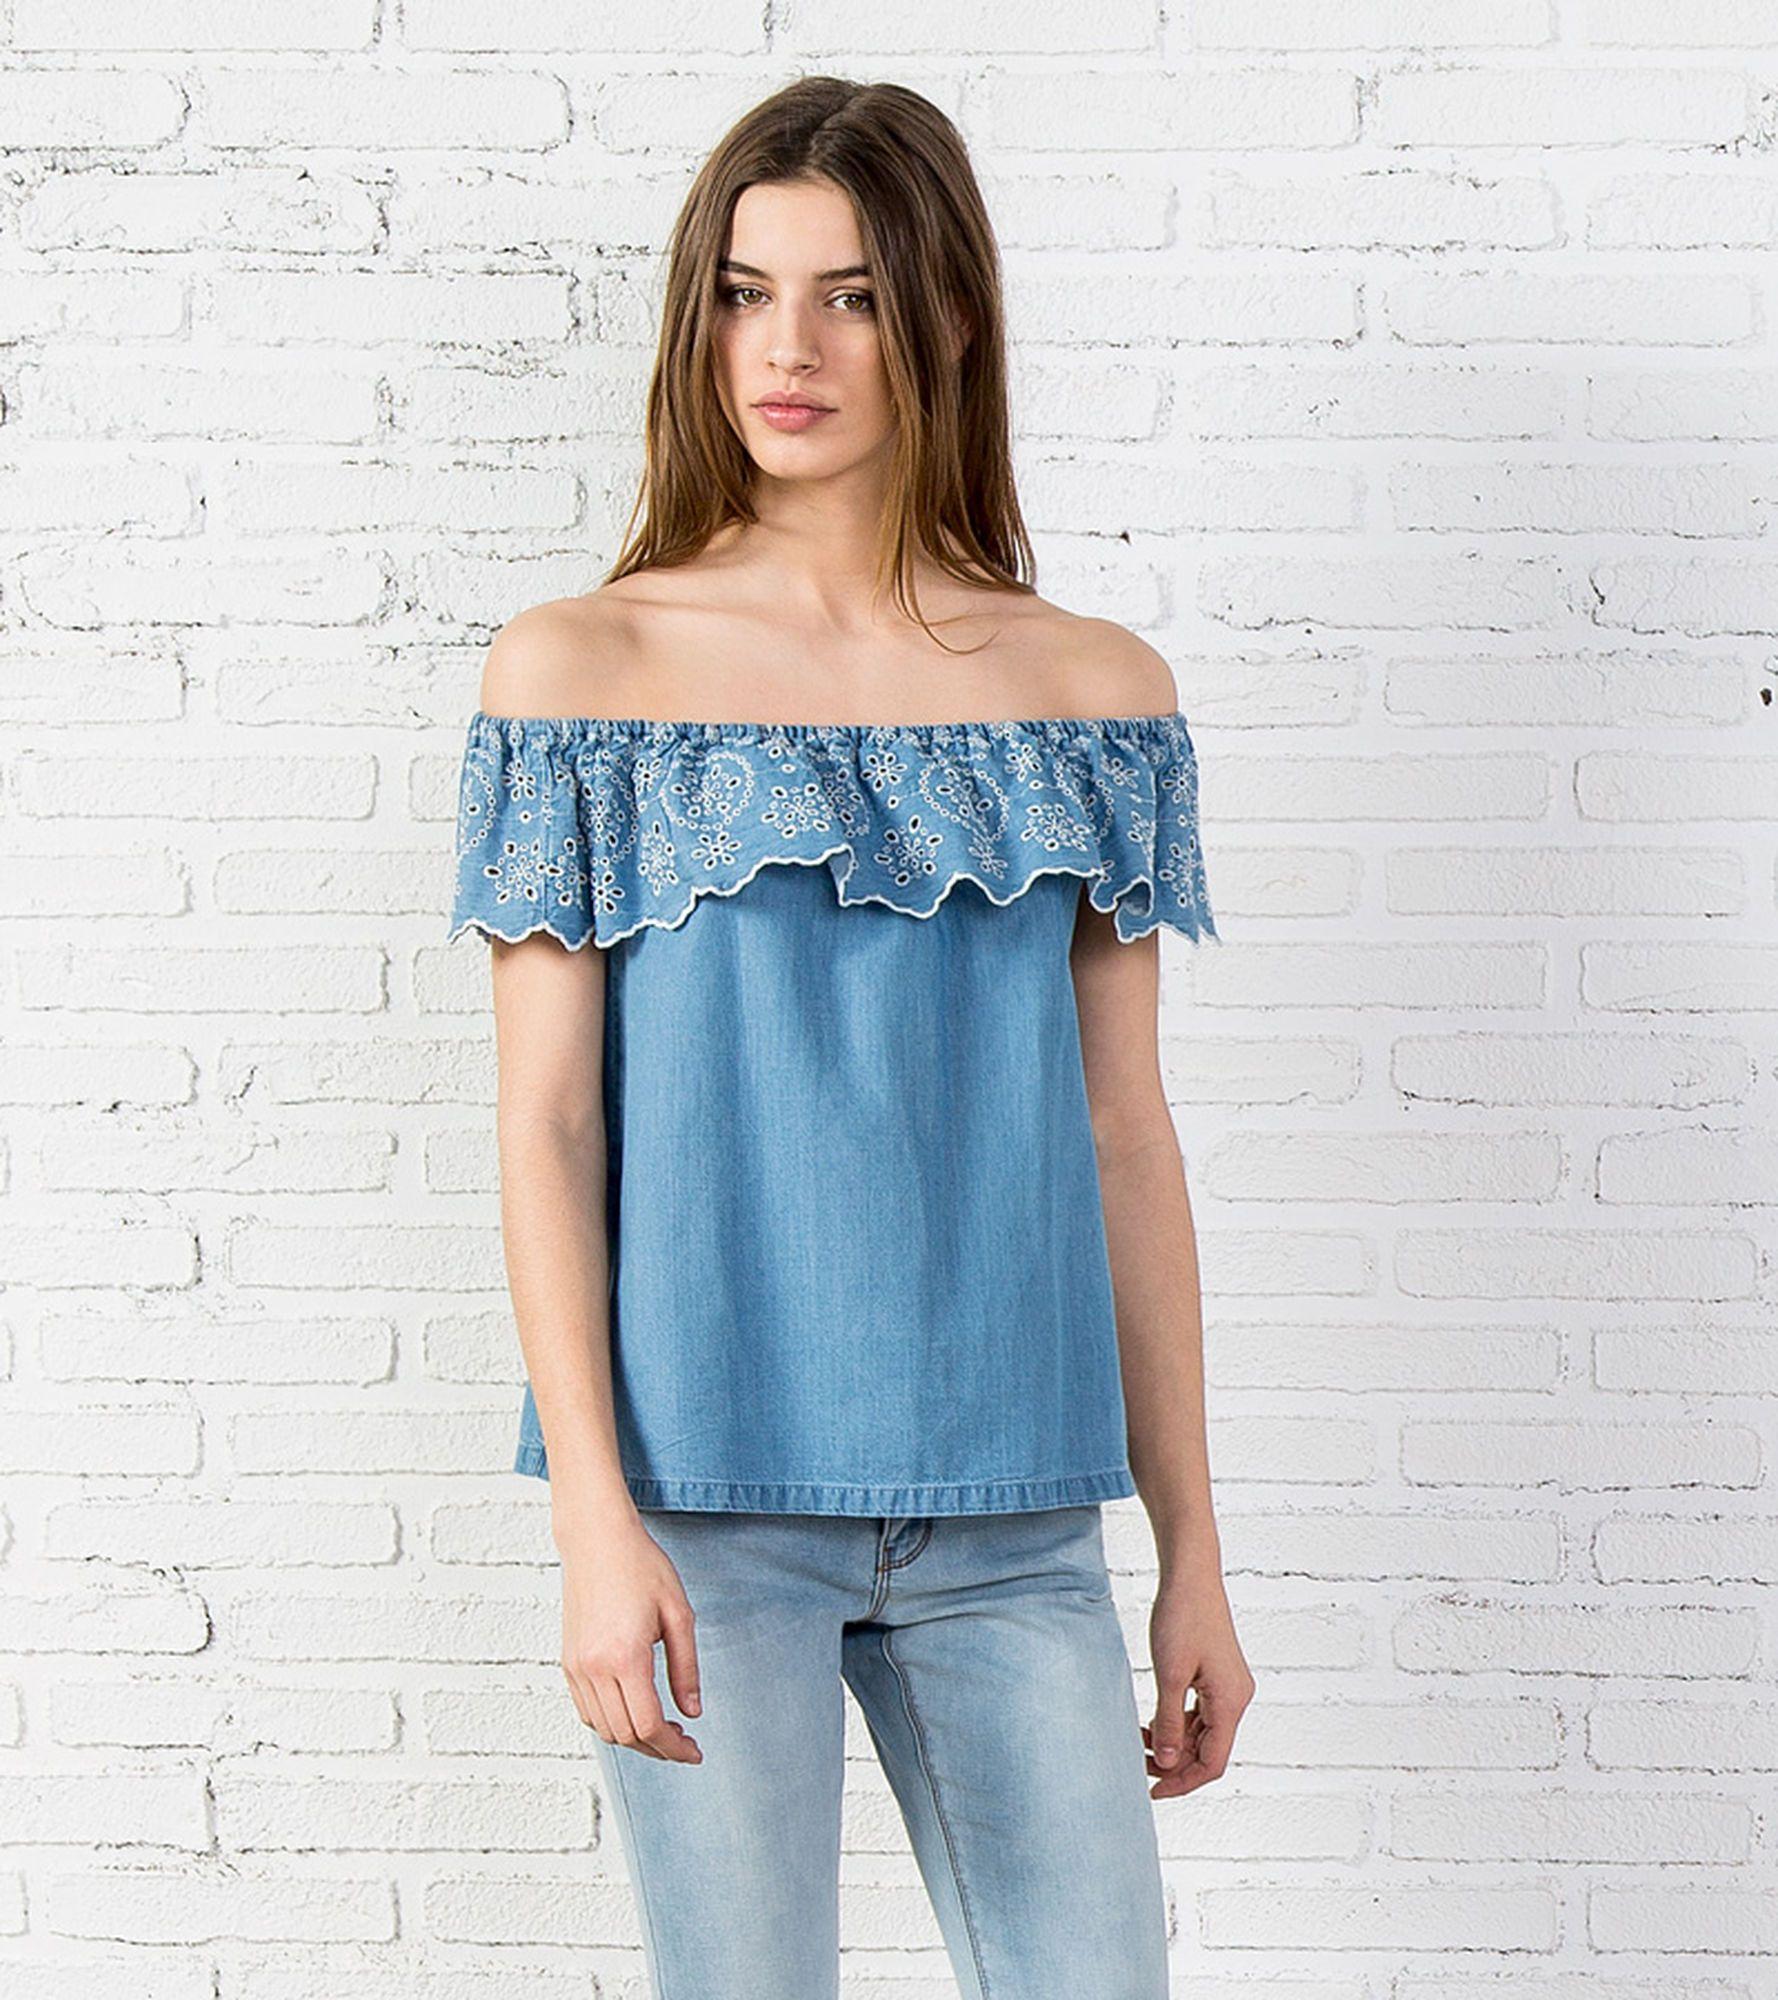 ba6c0bfa8f44 BLUSA DENIM VOLANTE - Camisas | Inspiration | Blusas, Blusa sin ...